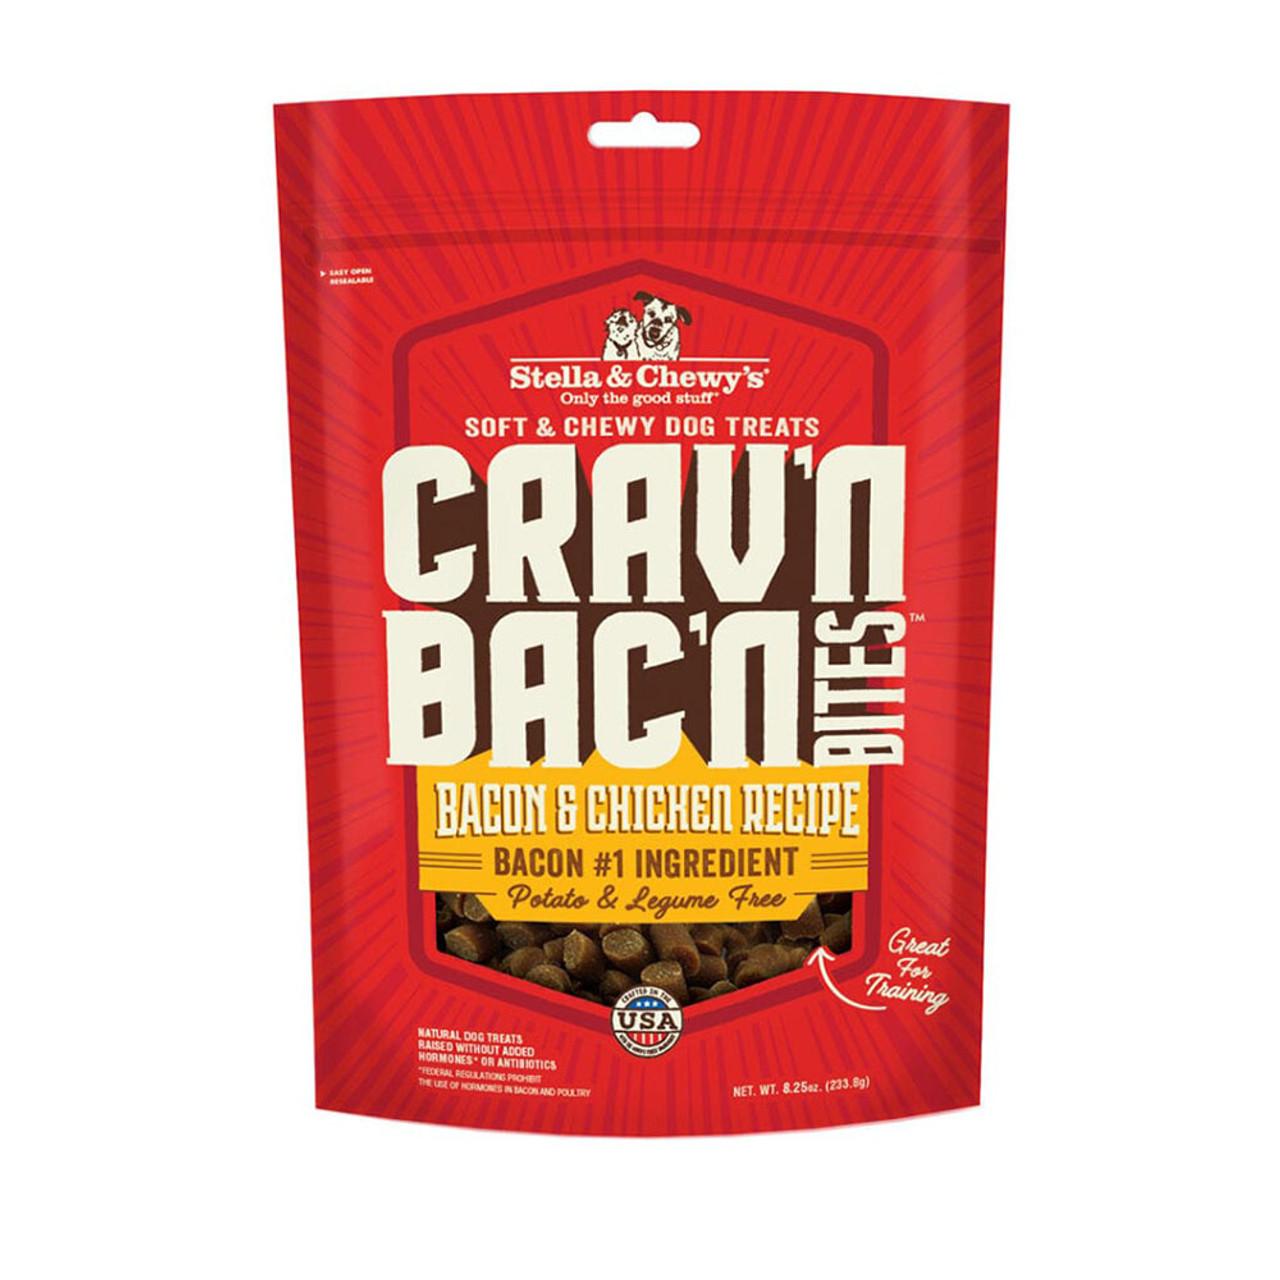 Stella & Chewy's Crav'n Bac'n Bites Bacon & Chicken Recipe Dog Treats - Front